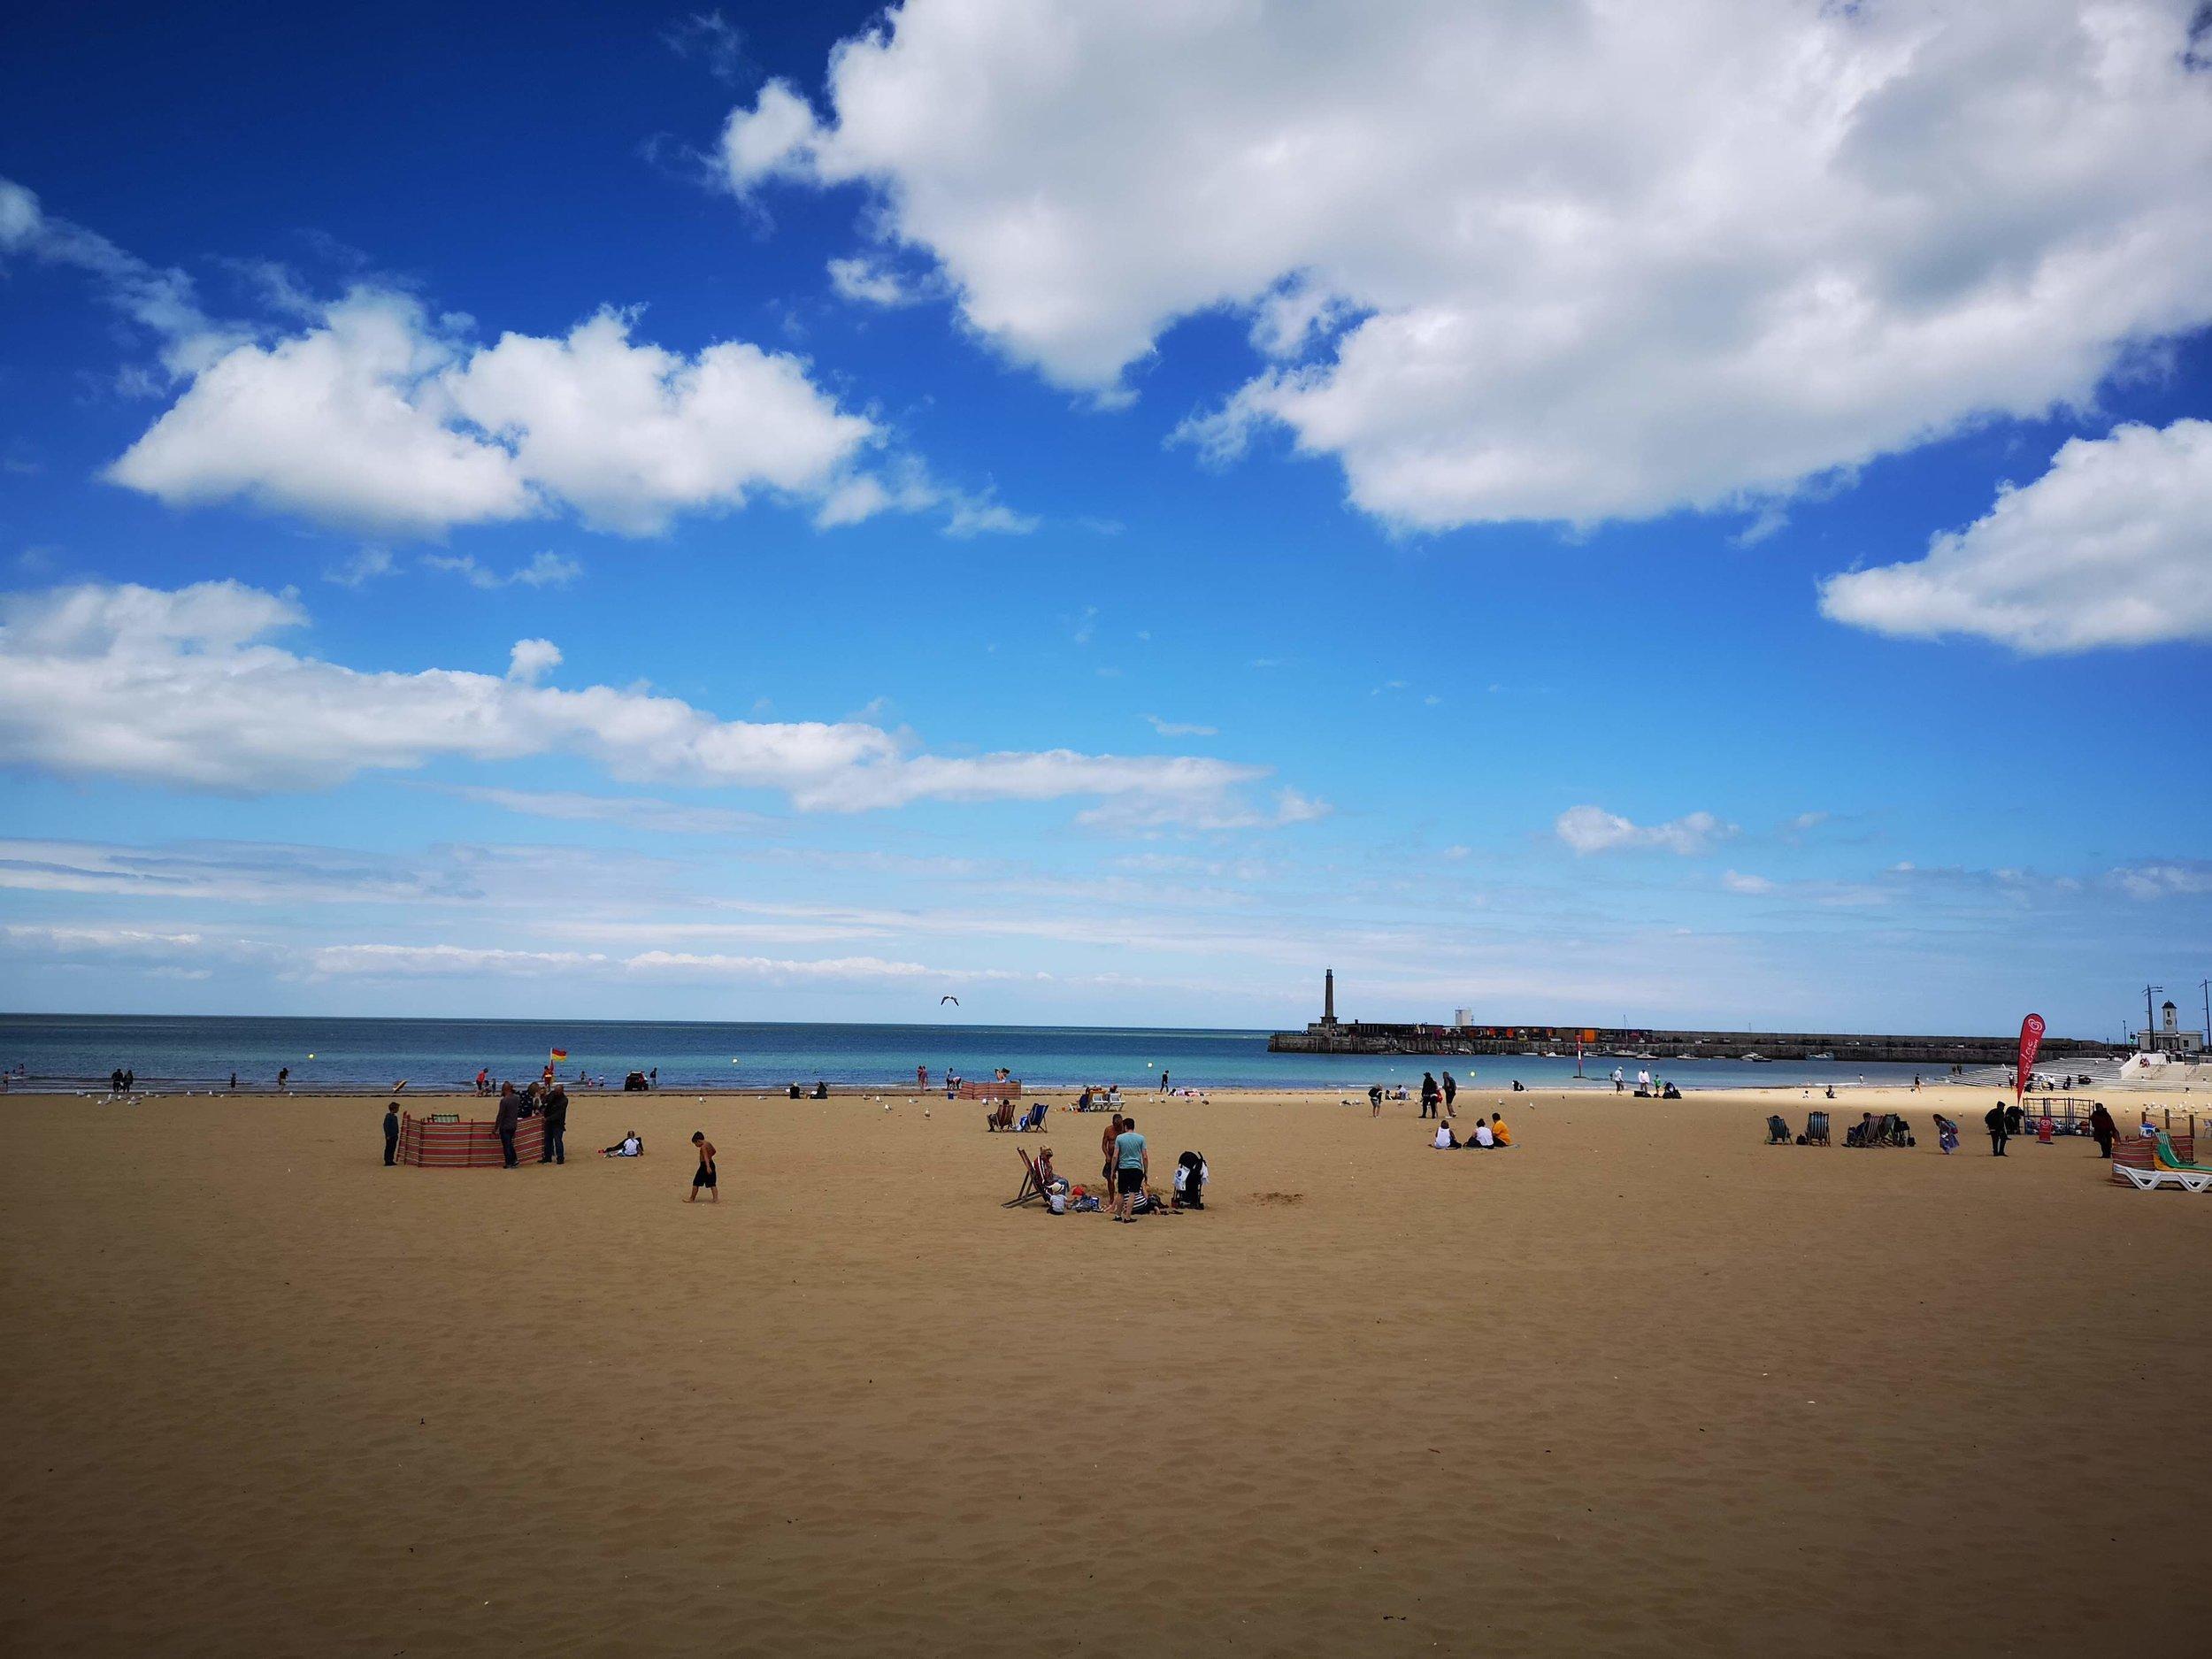 Margate beach front